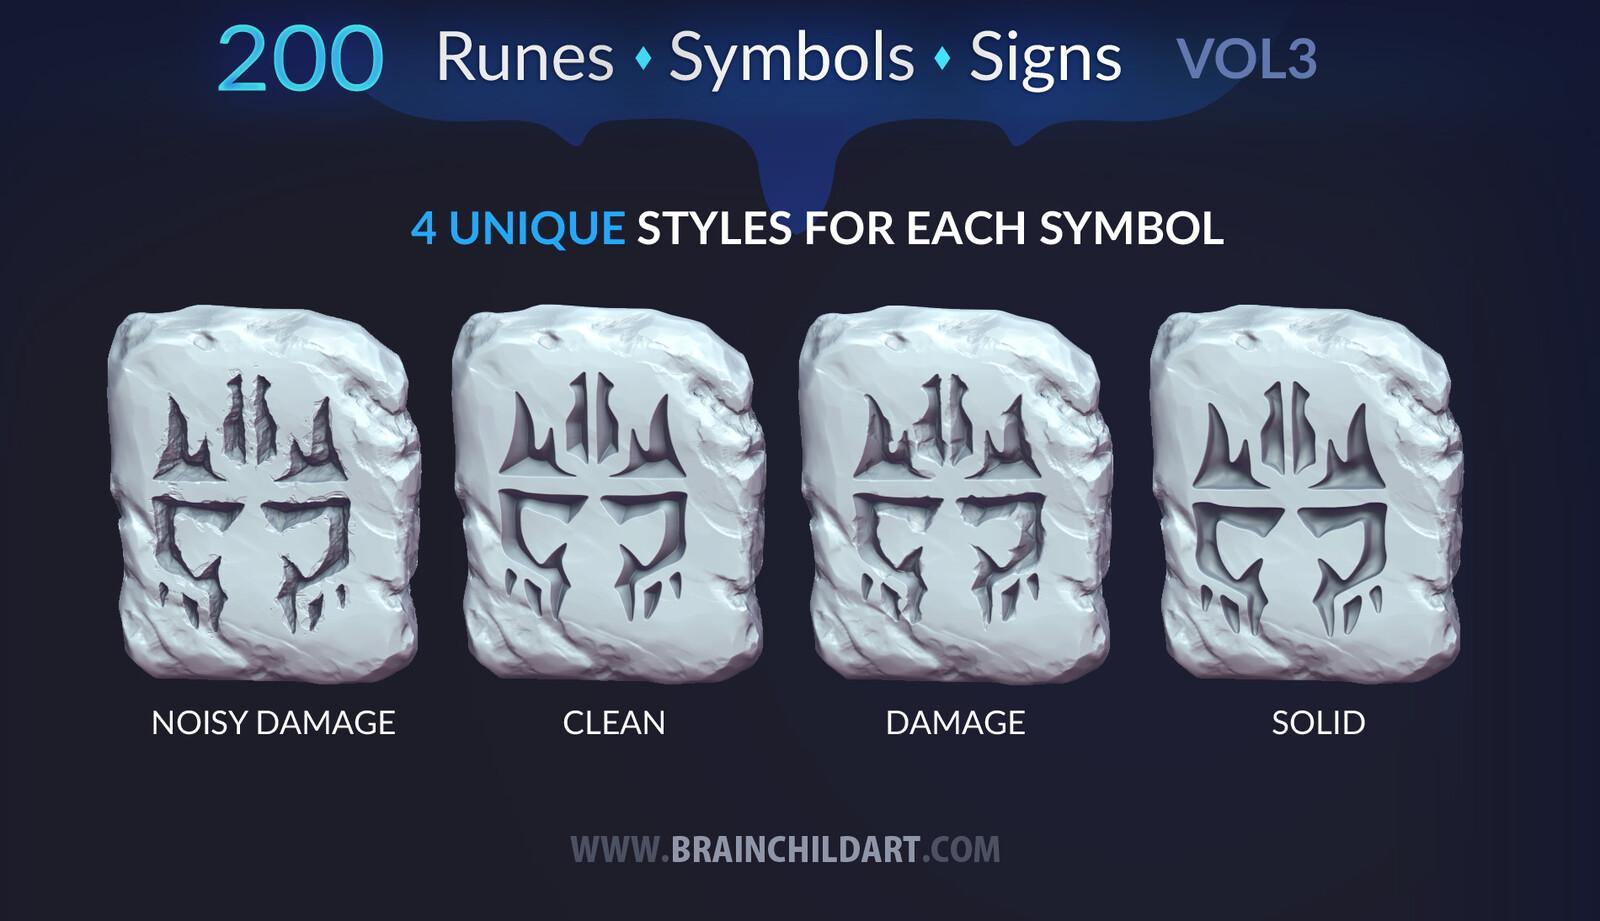 Buy https://www.artstation.com/a/1258631 | VOL. 3 - 200 Runes, Signs & Symbols (800 Alpha Textures) Zbrush, Blender, Substance...